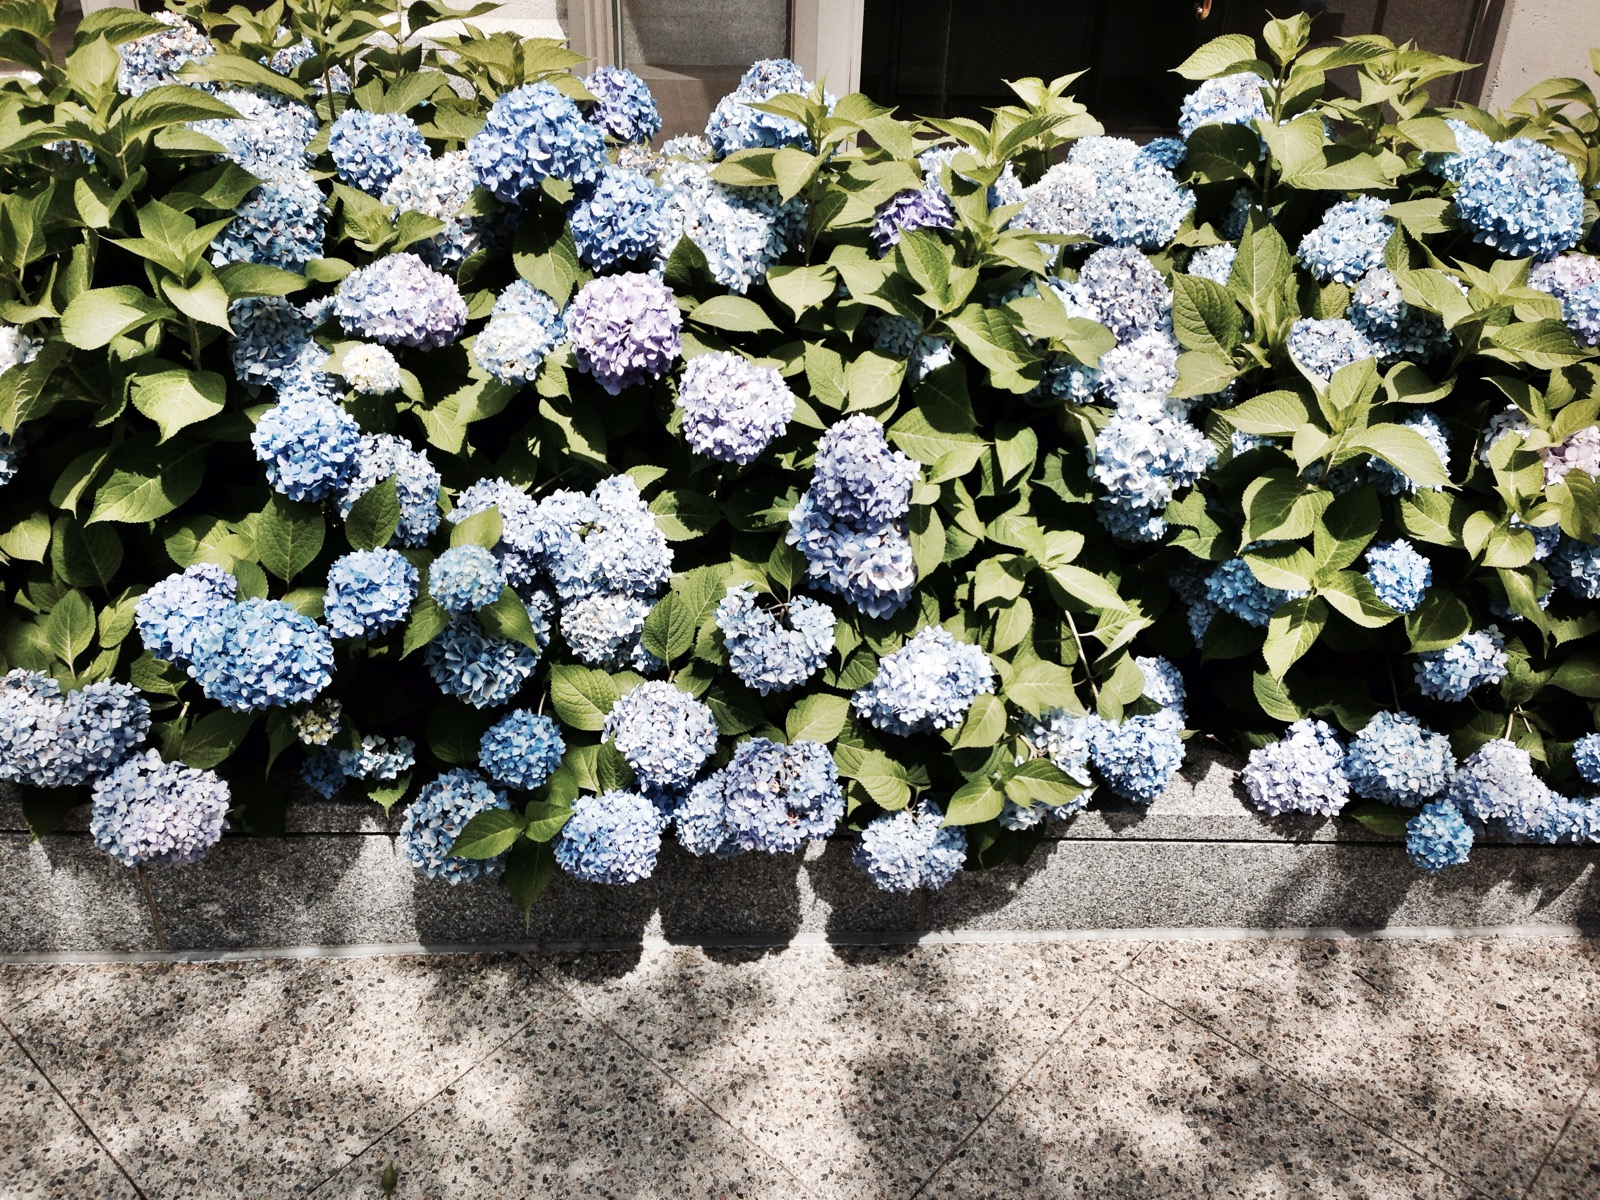 {Hydrangeas on Newbury St. are looking good}